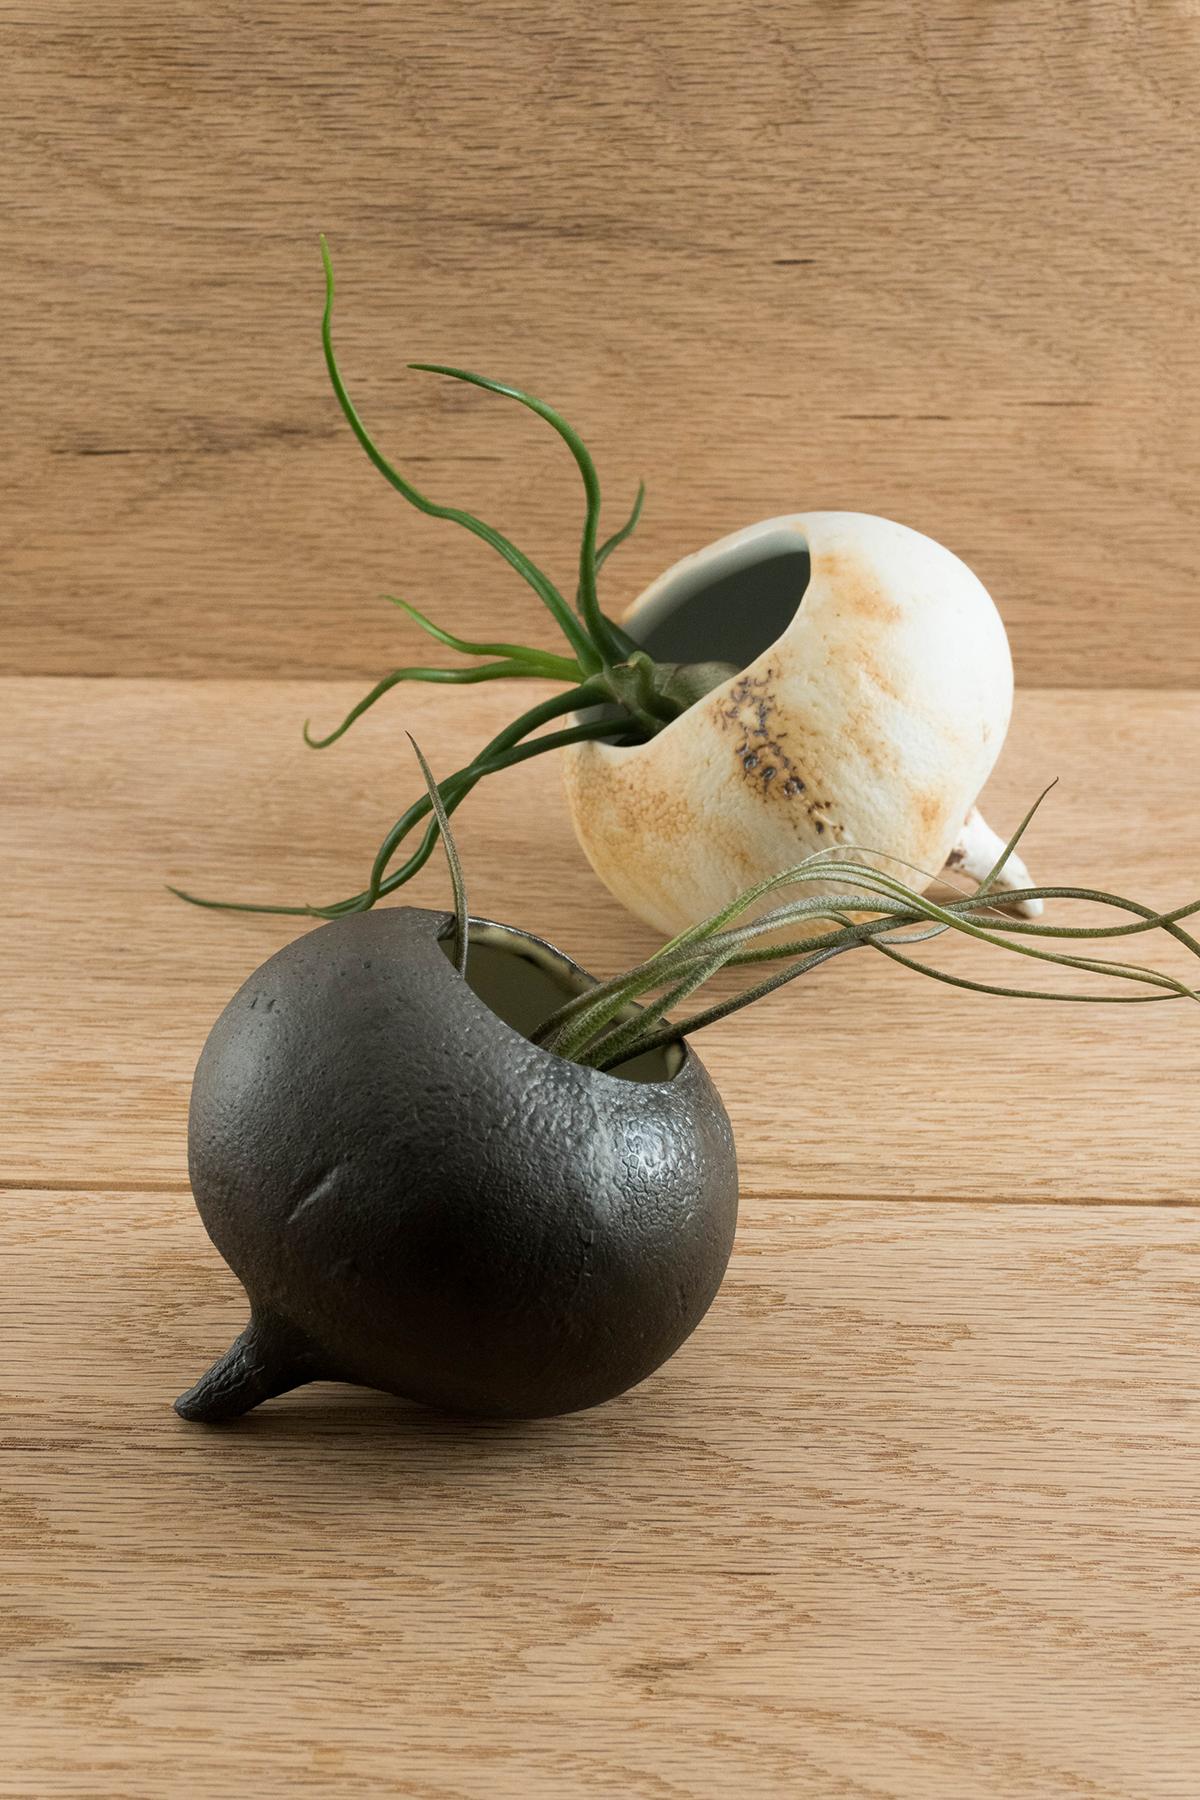 greenpointclaylab-alanalaurenceramics-radishplanters.jpg